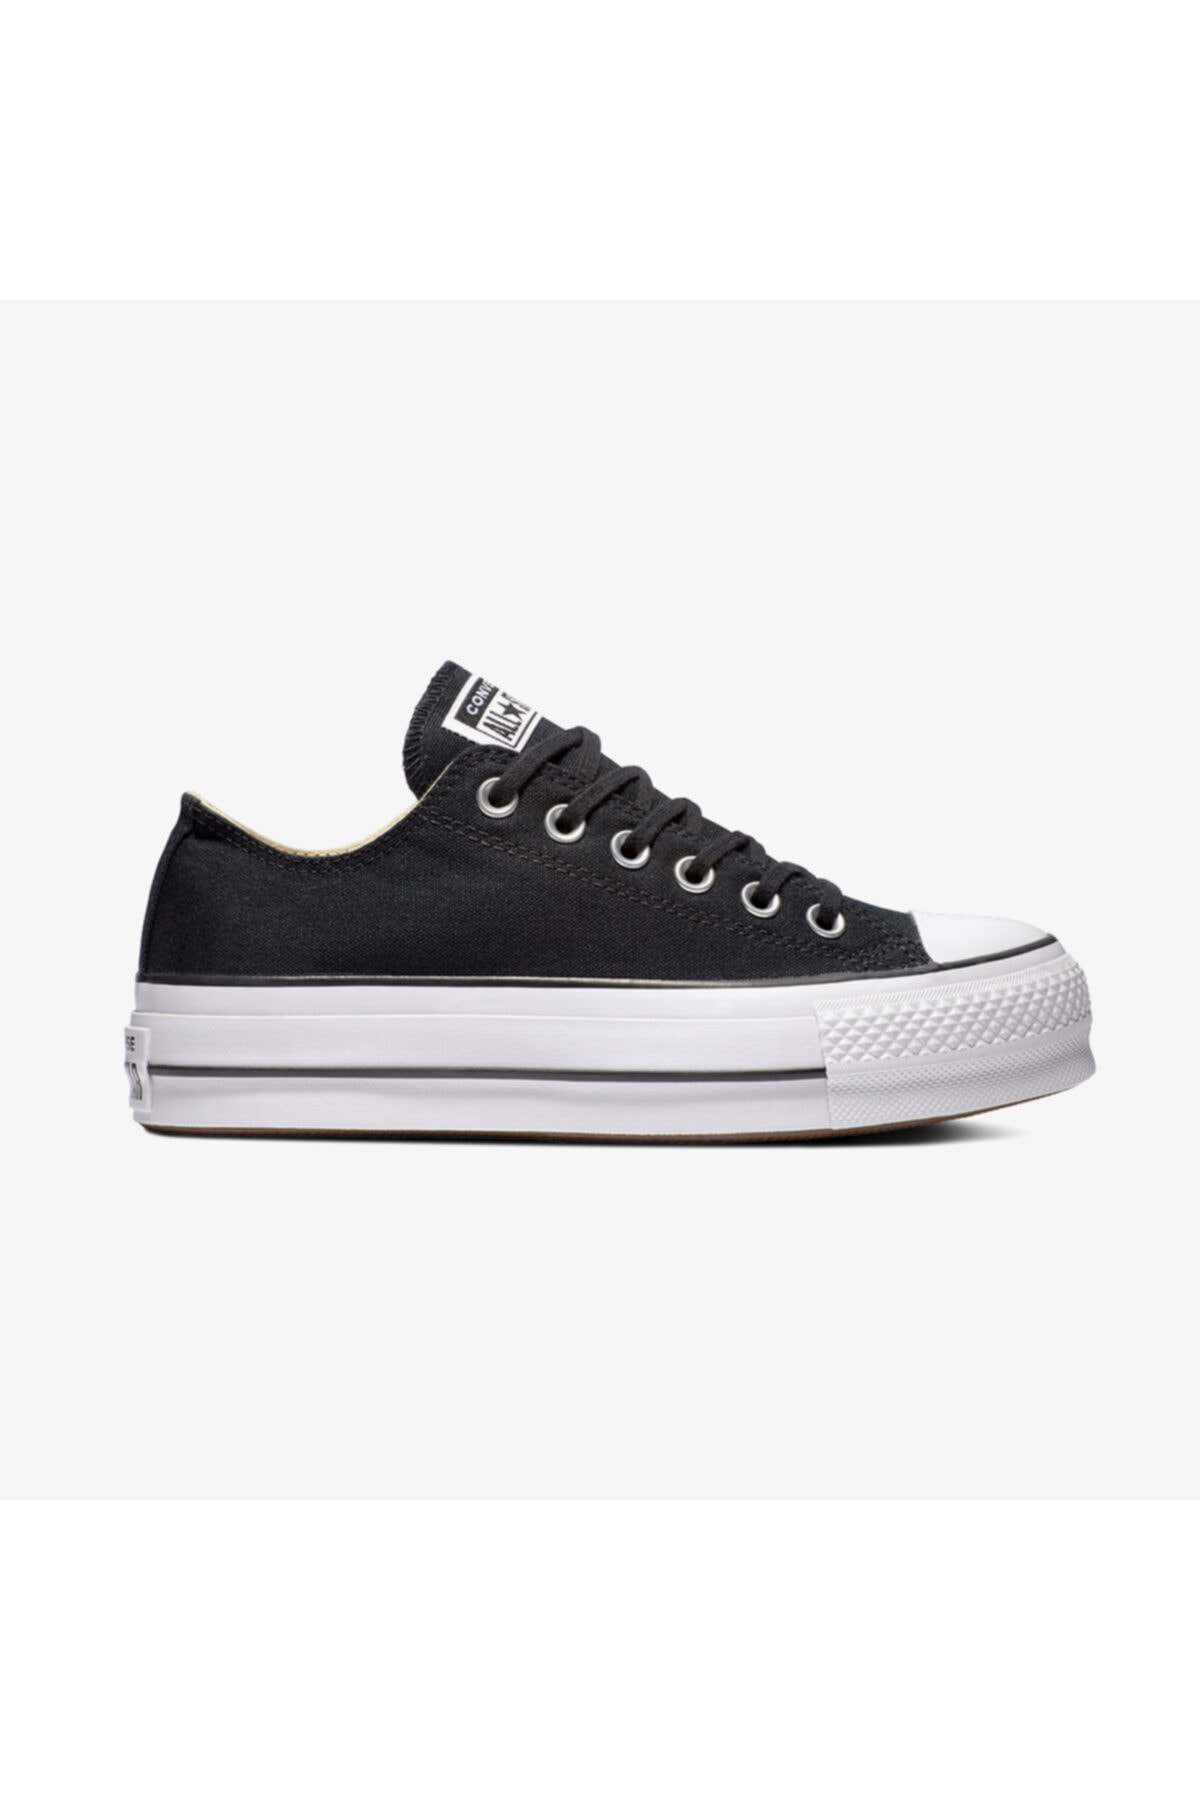 converse Chuck Taylor All Star Lift Kadın Siyah Sneaker 1